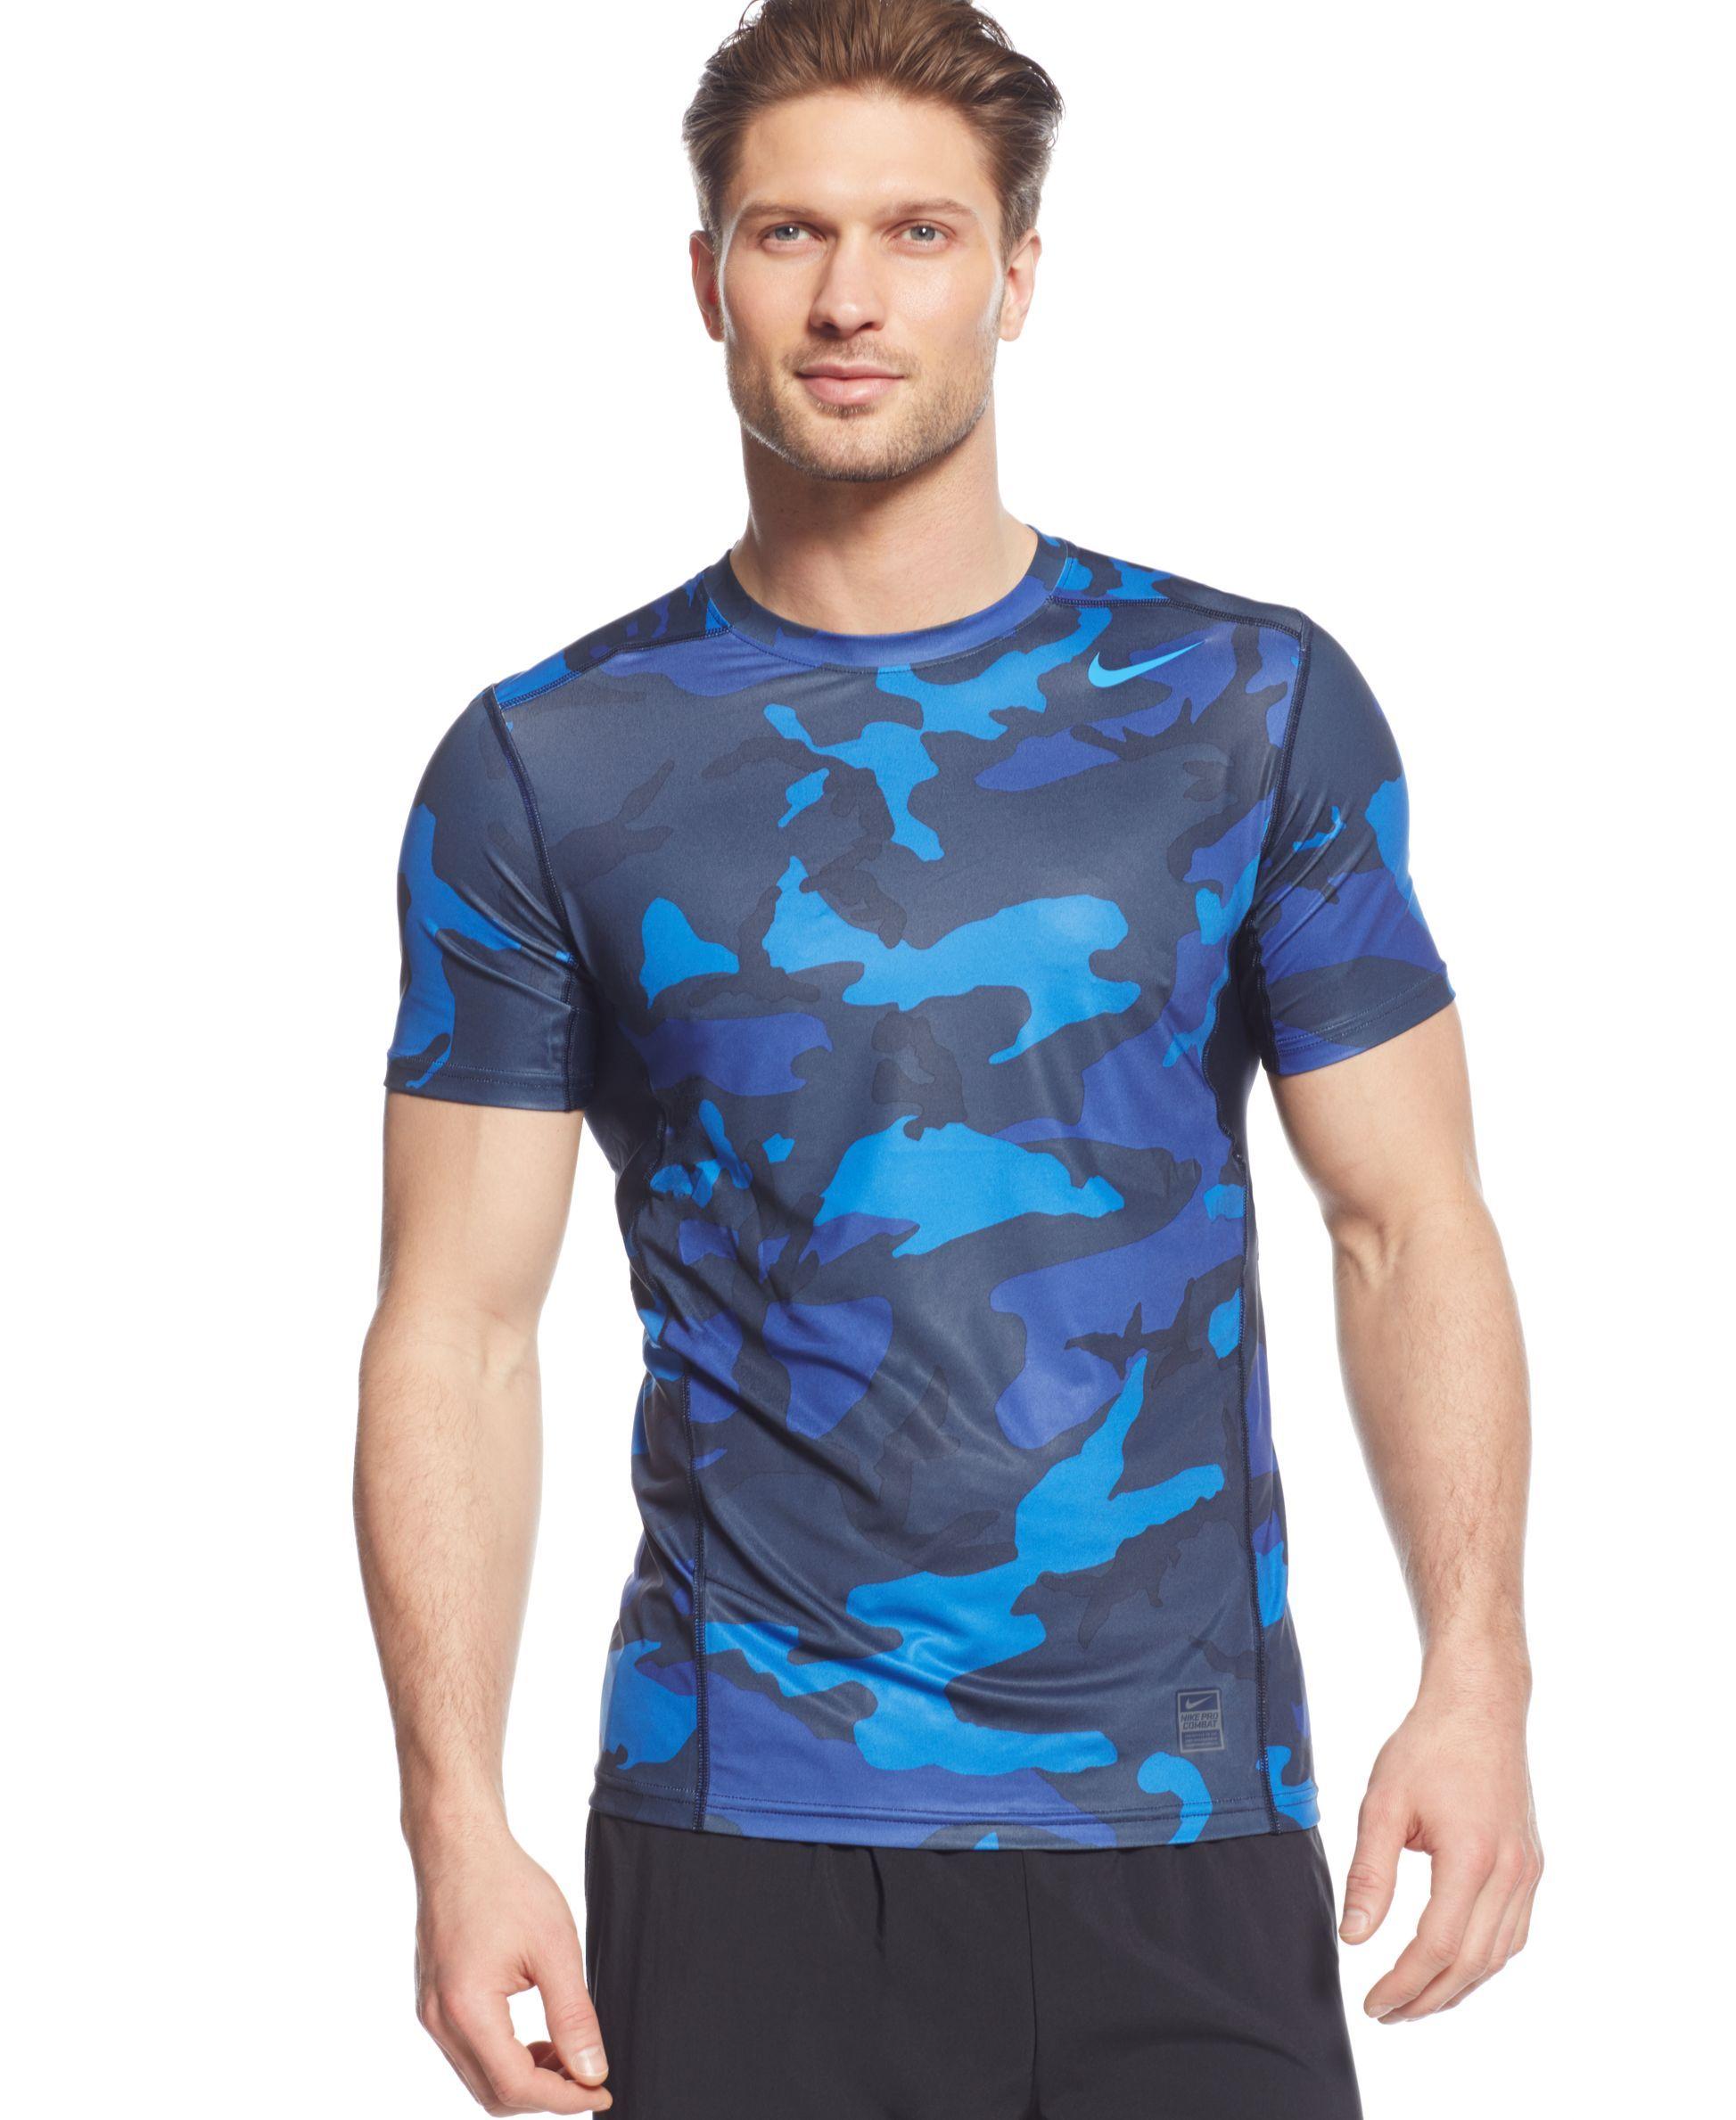 Nike Hypercool Dri-fit Camo T-Shirt